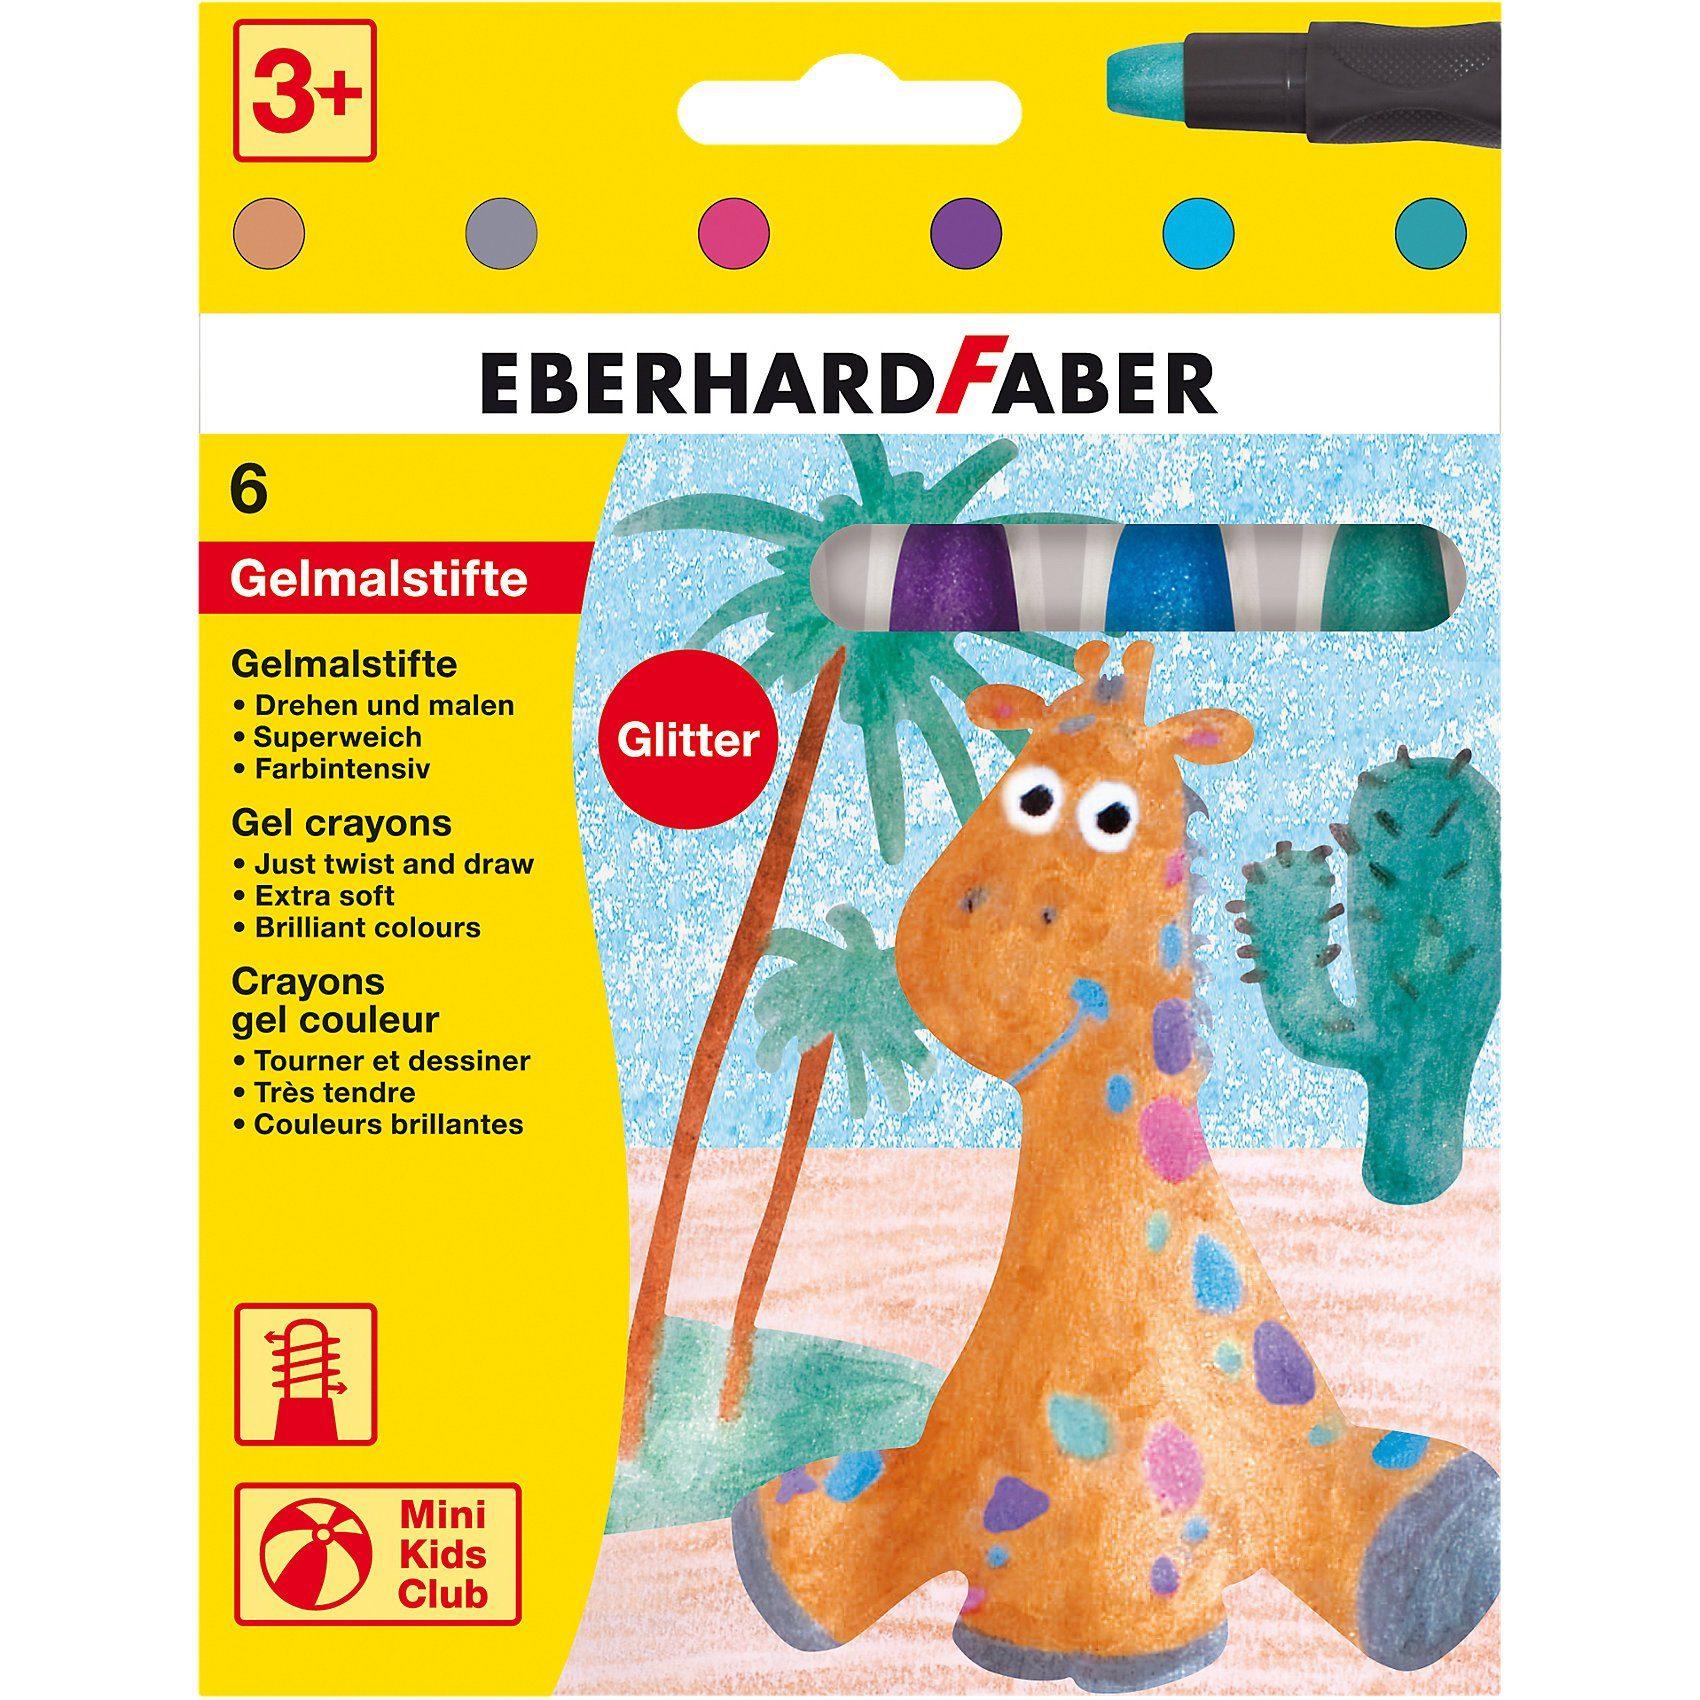 Eberhard Faber Mini Kids Gelmalstifte, 6 Glitter-Farben